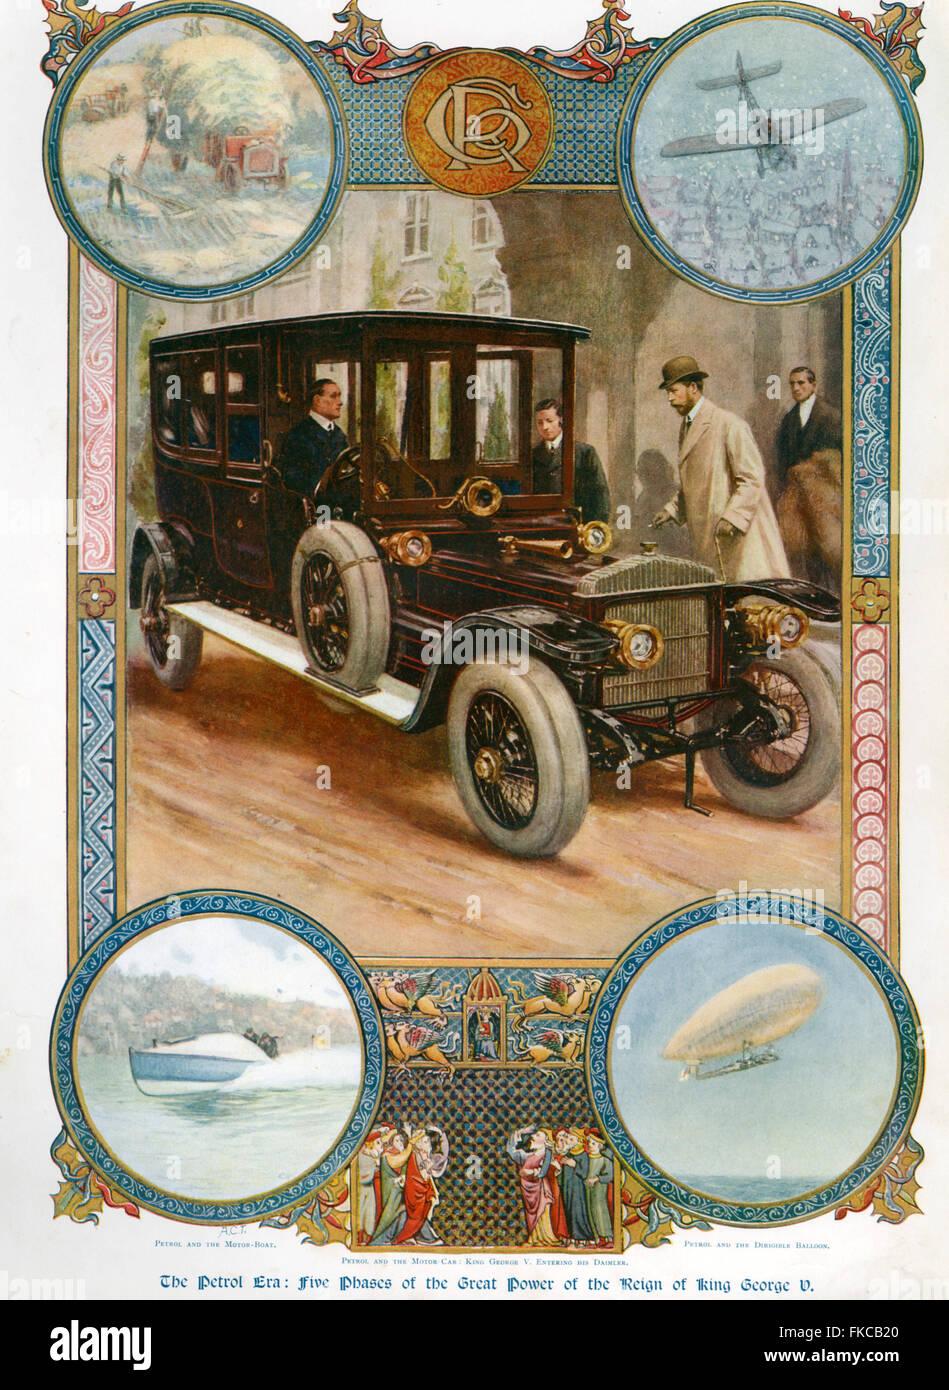 1920s UK Petrol and the Motor Car Magazine Advert - Stock Image